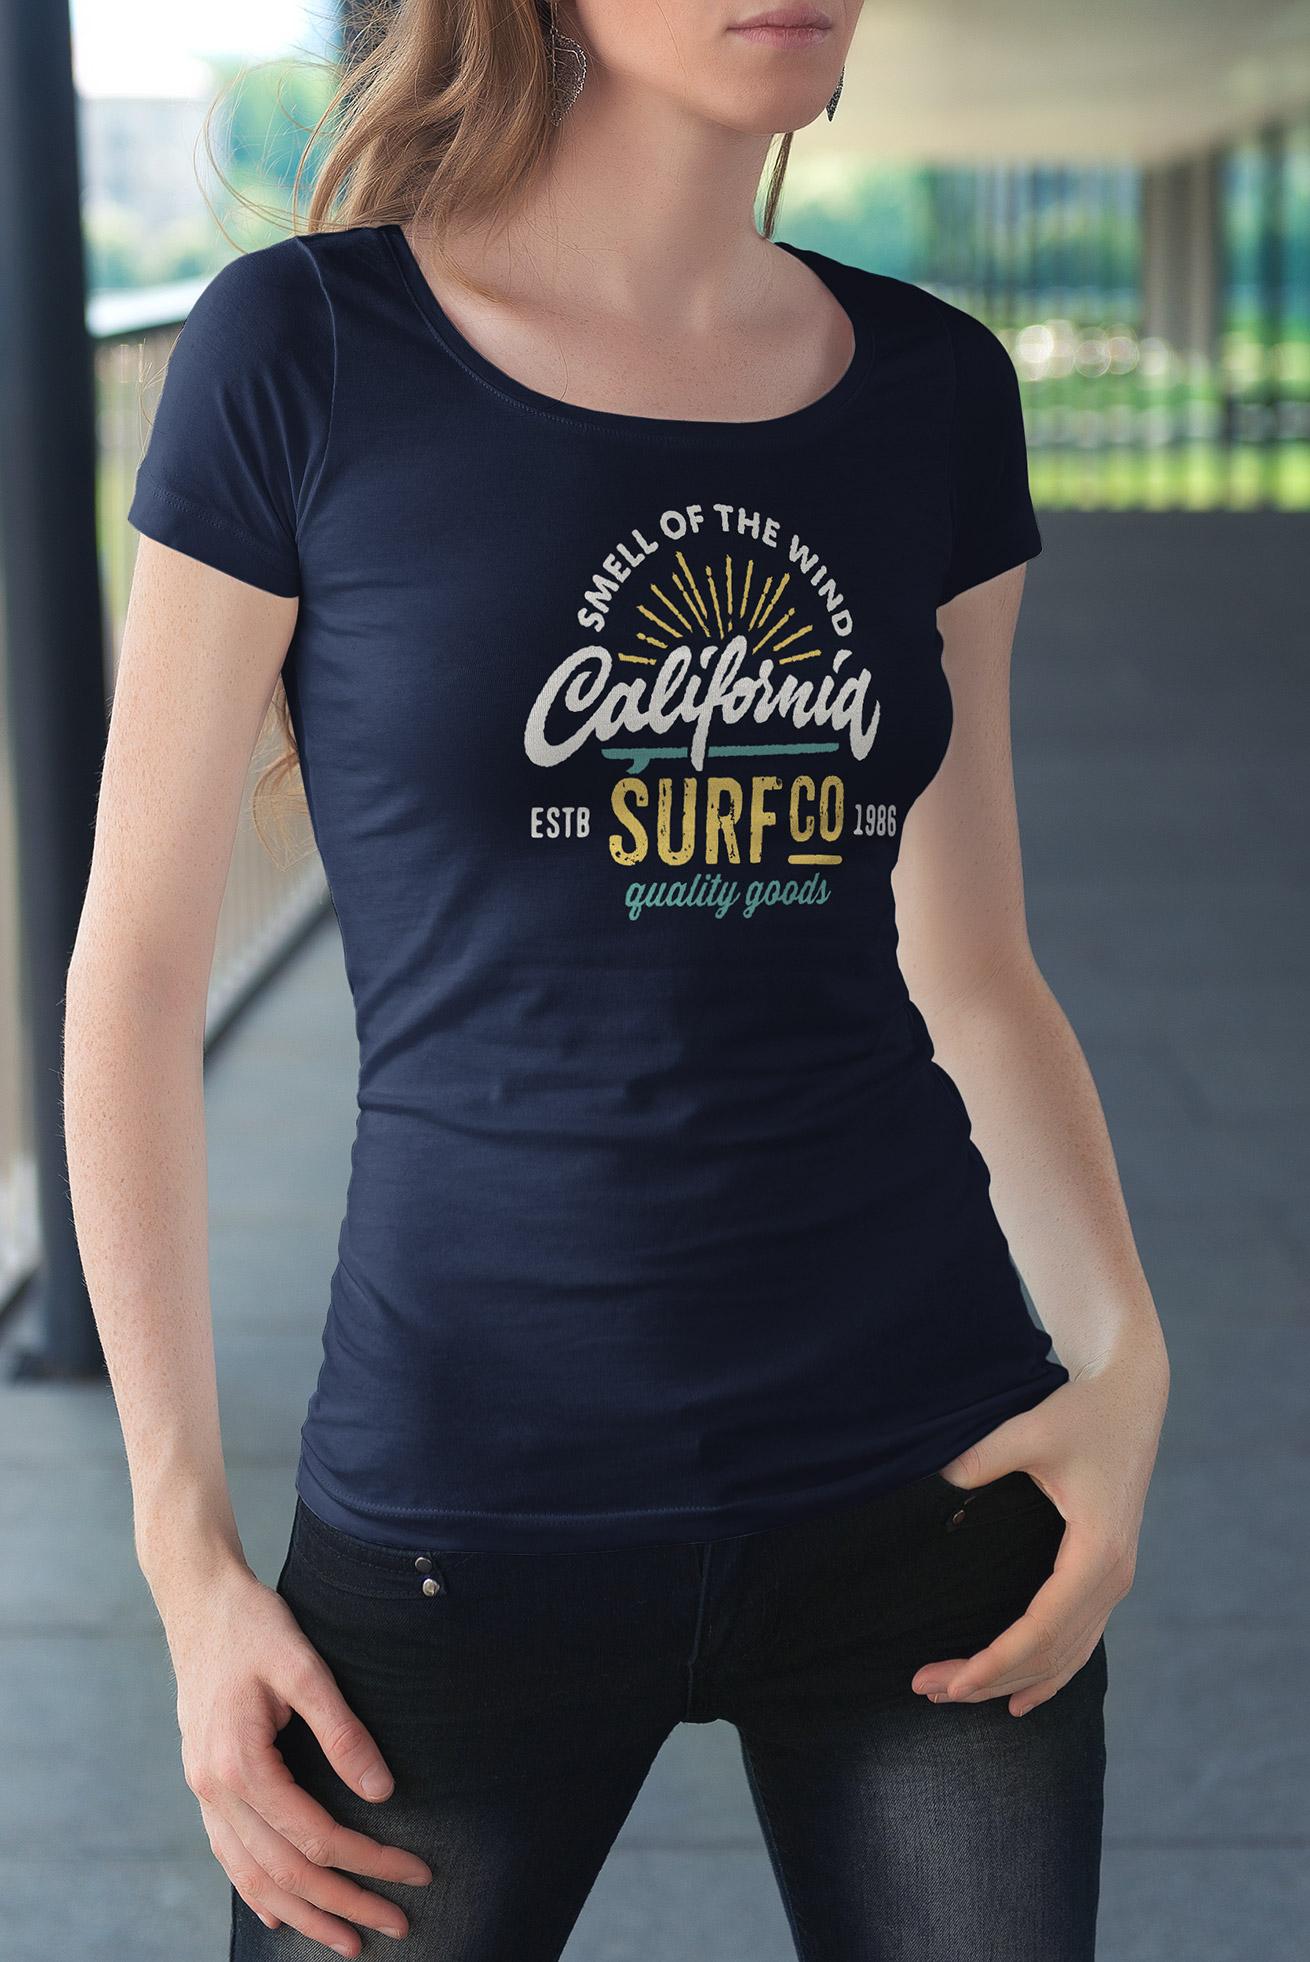 free t shirt mockup